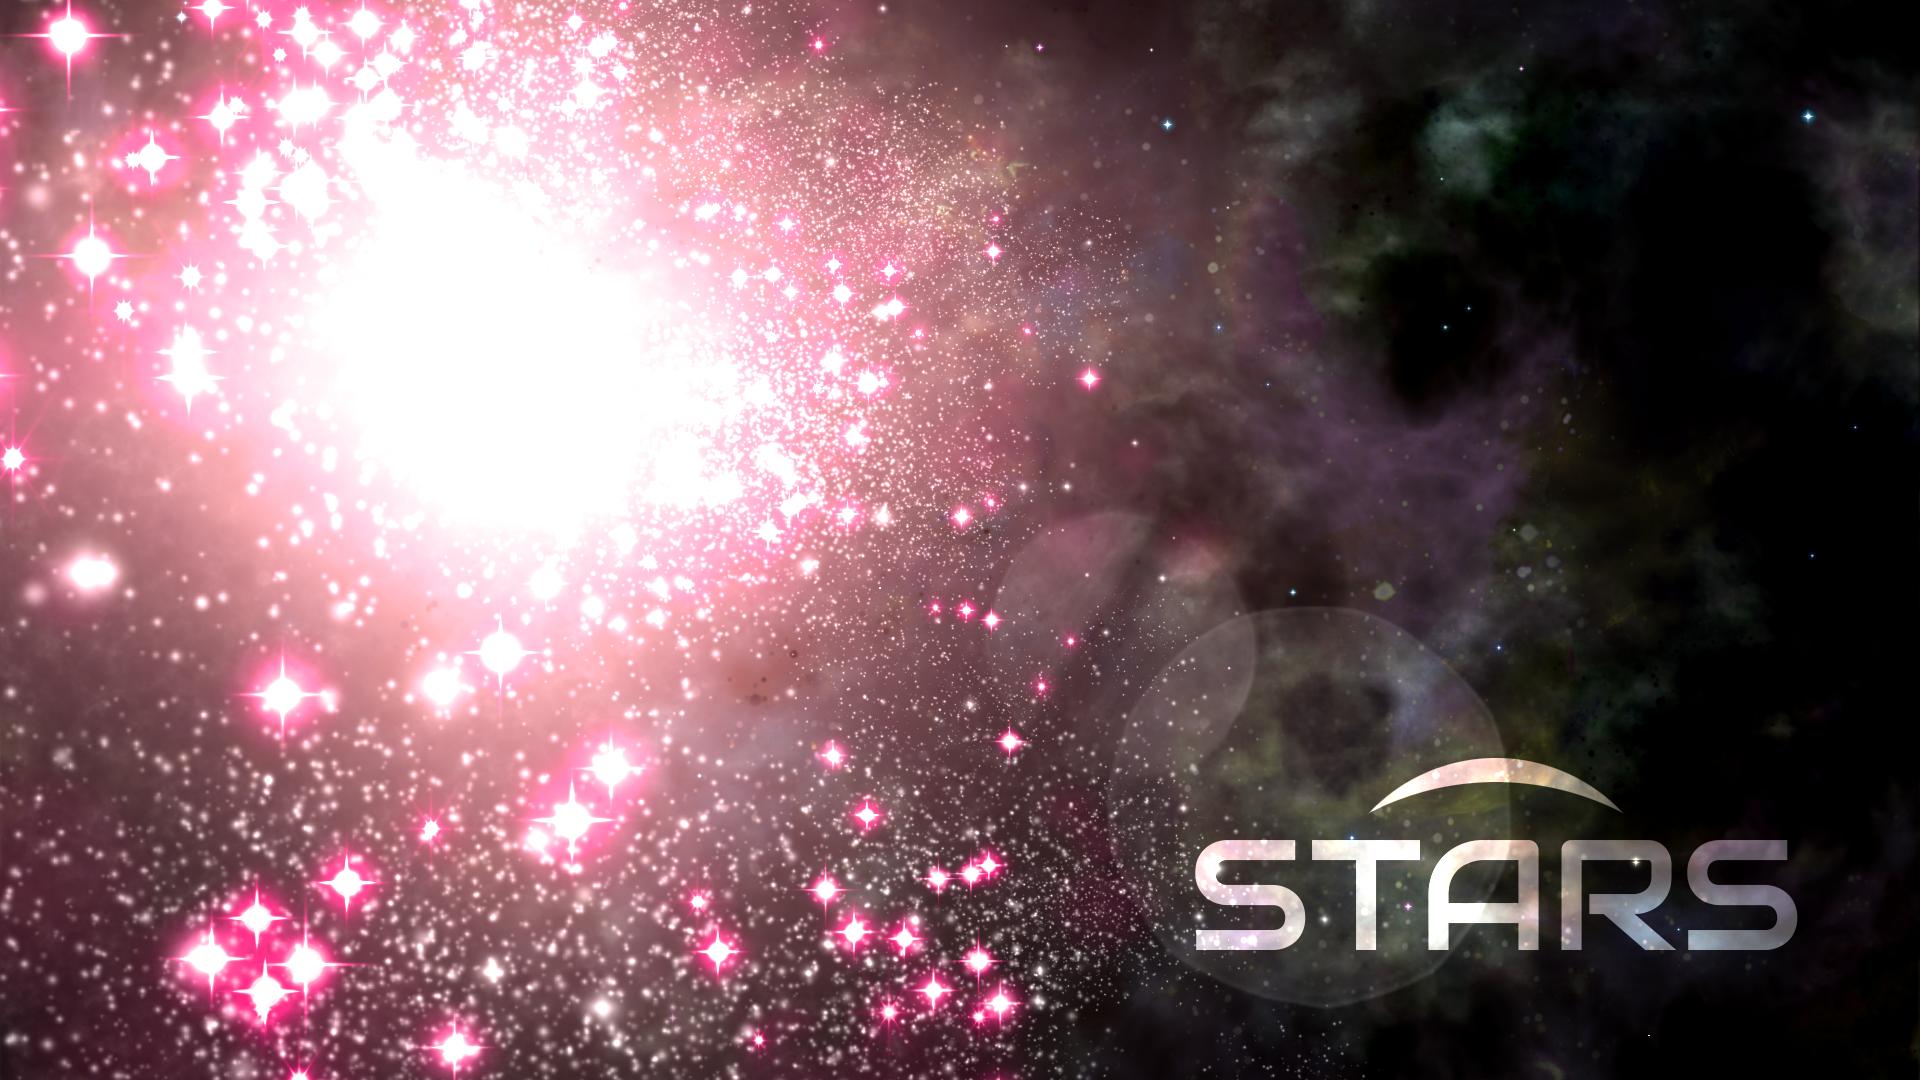 Stars - Galaxy